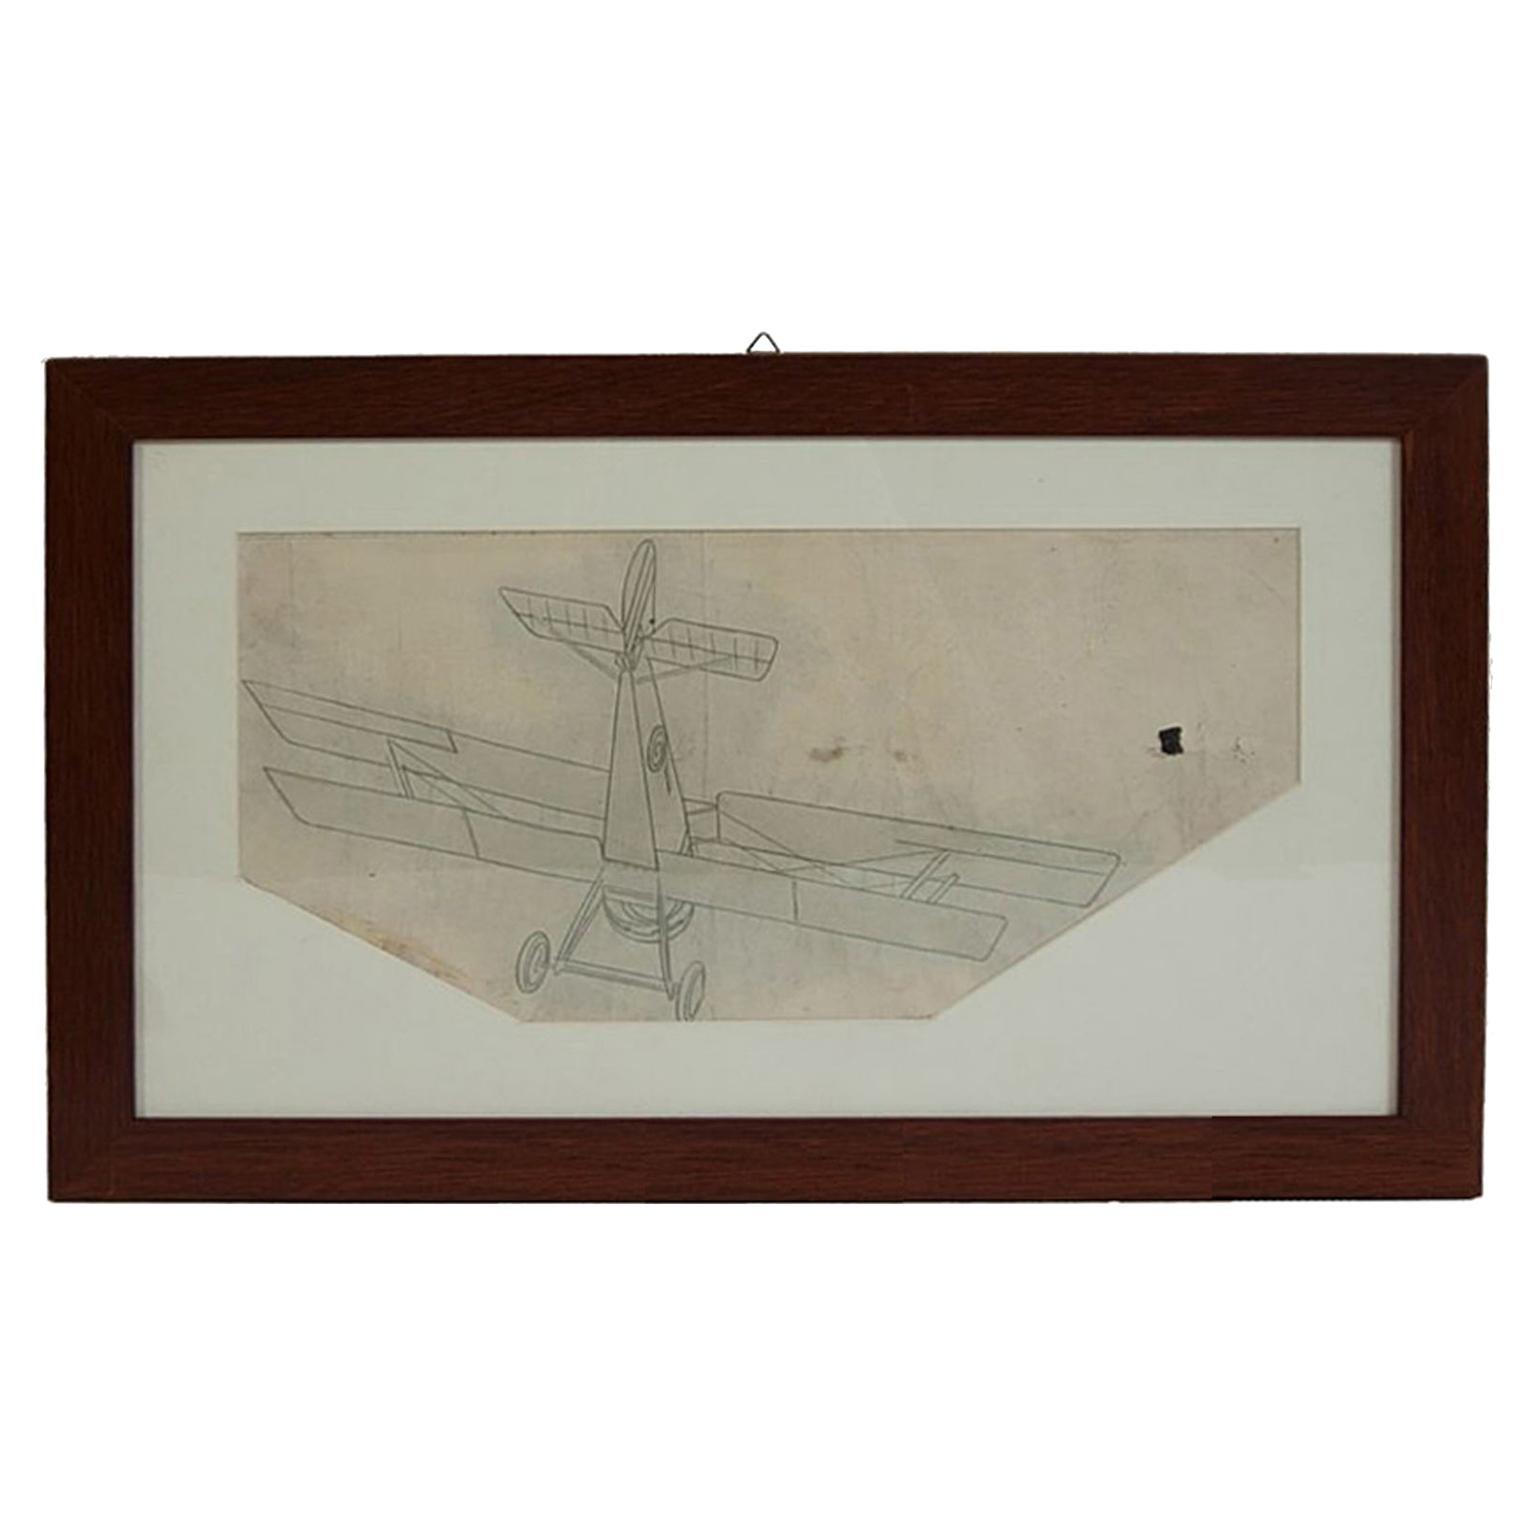 Vintage Original Aviation Pencil Drawing Depicting a Hanriot HD 1 WWI Aircraft